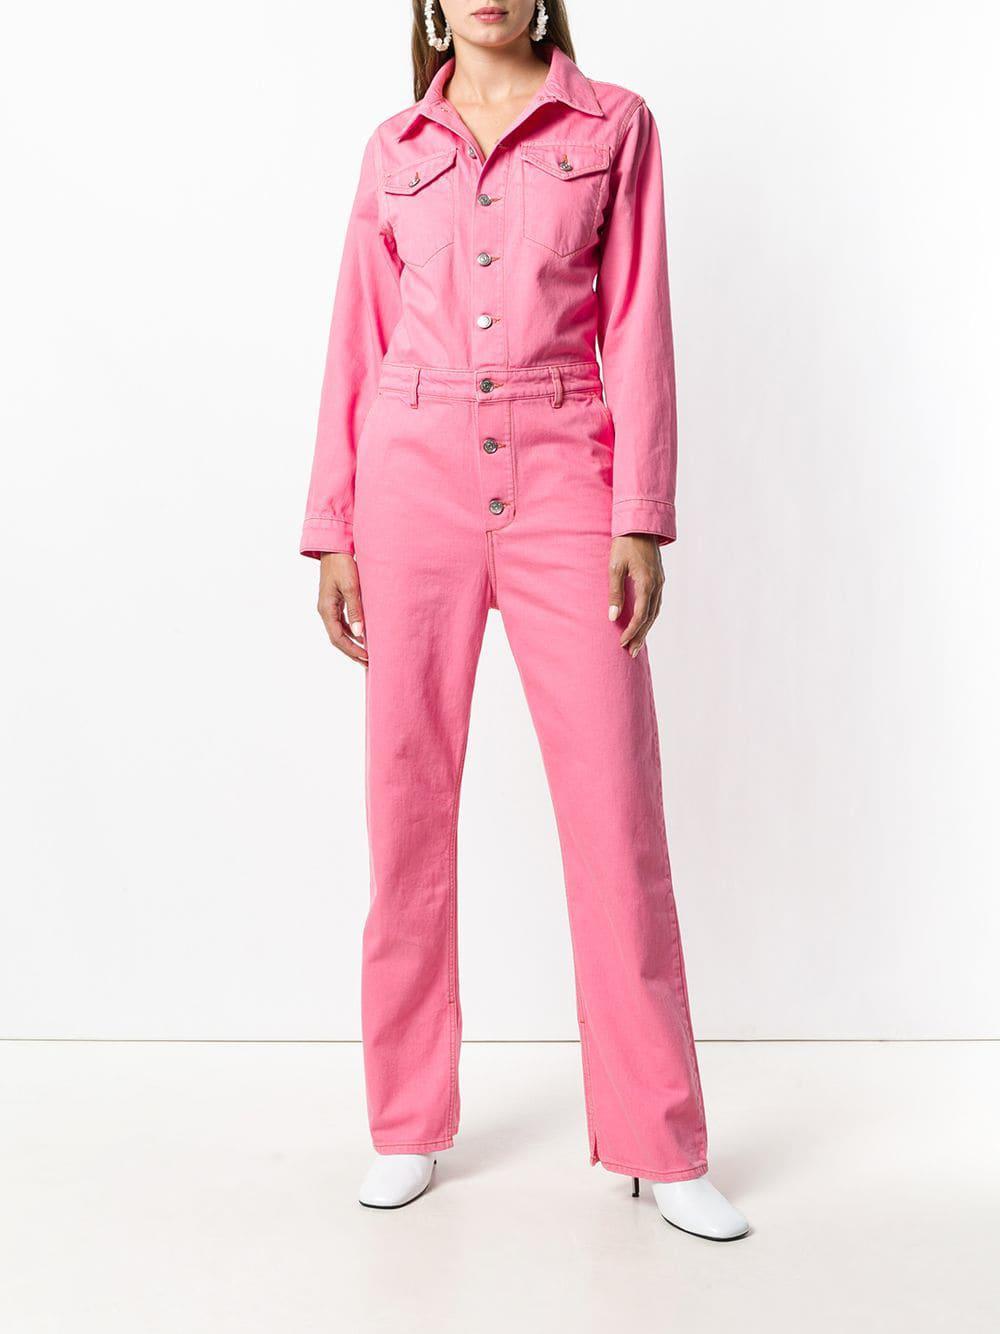 a985c3fe Ganni Denim Boiler Suit in Pink - Lyst